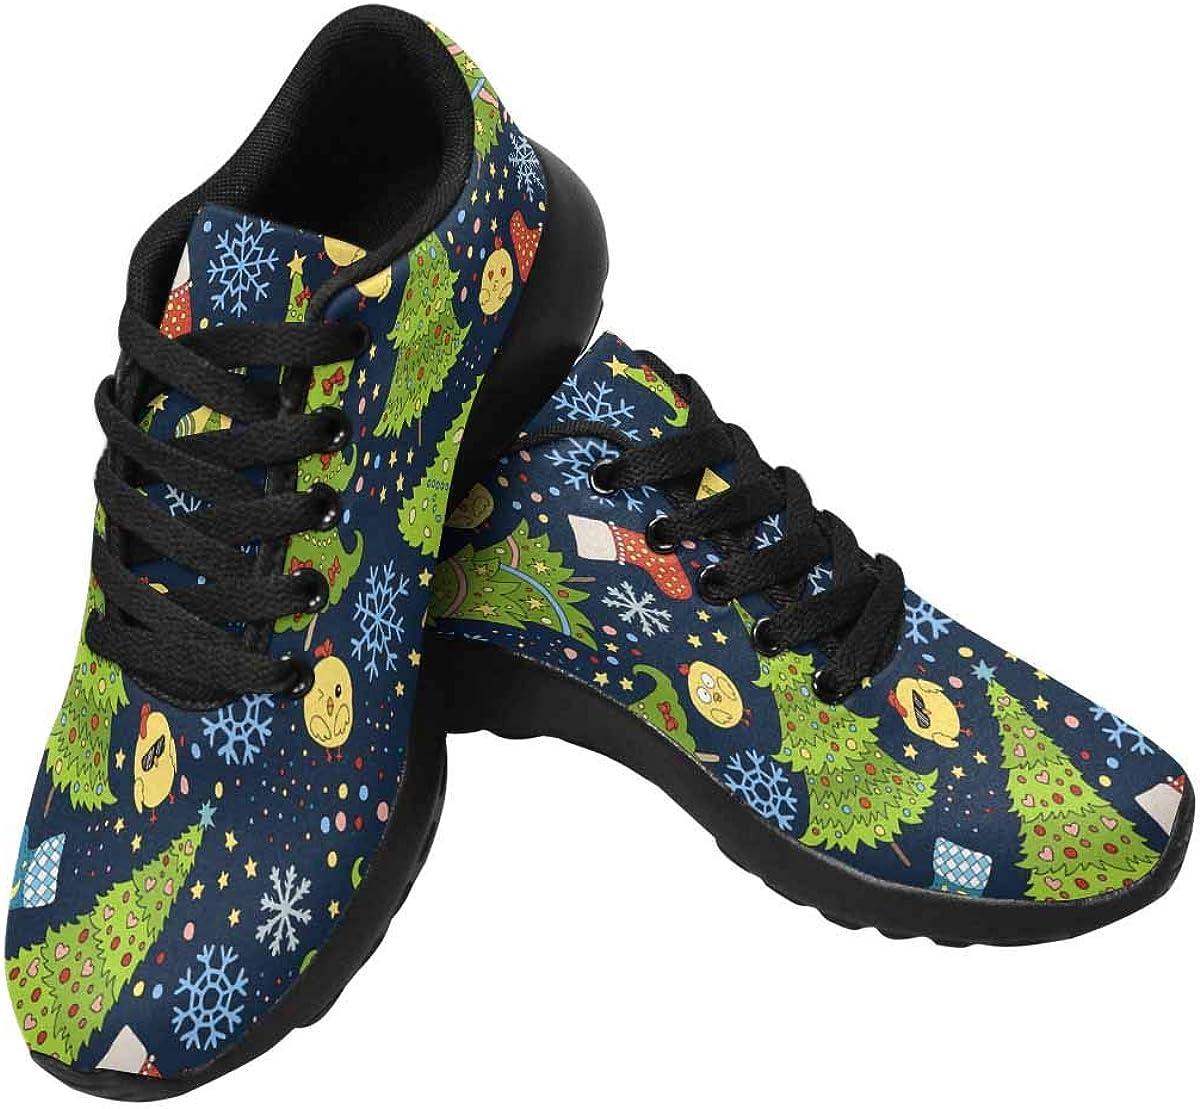 InterestPrint Women's Running Sneakers Outdoors Shoes